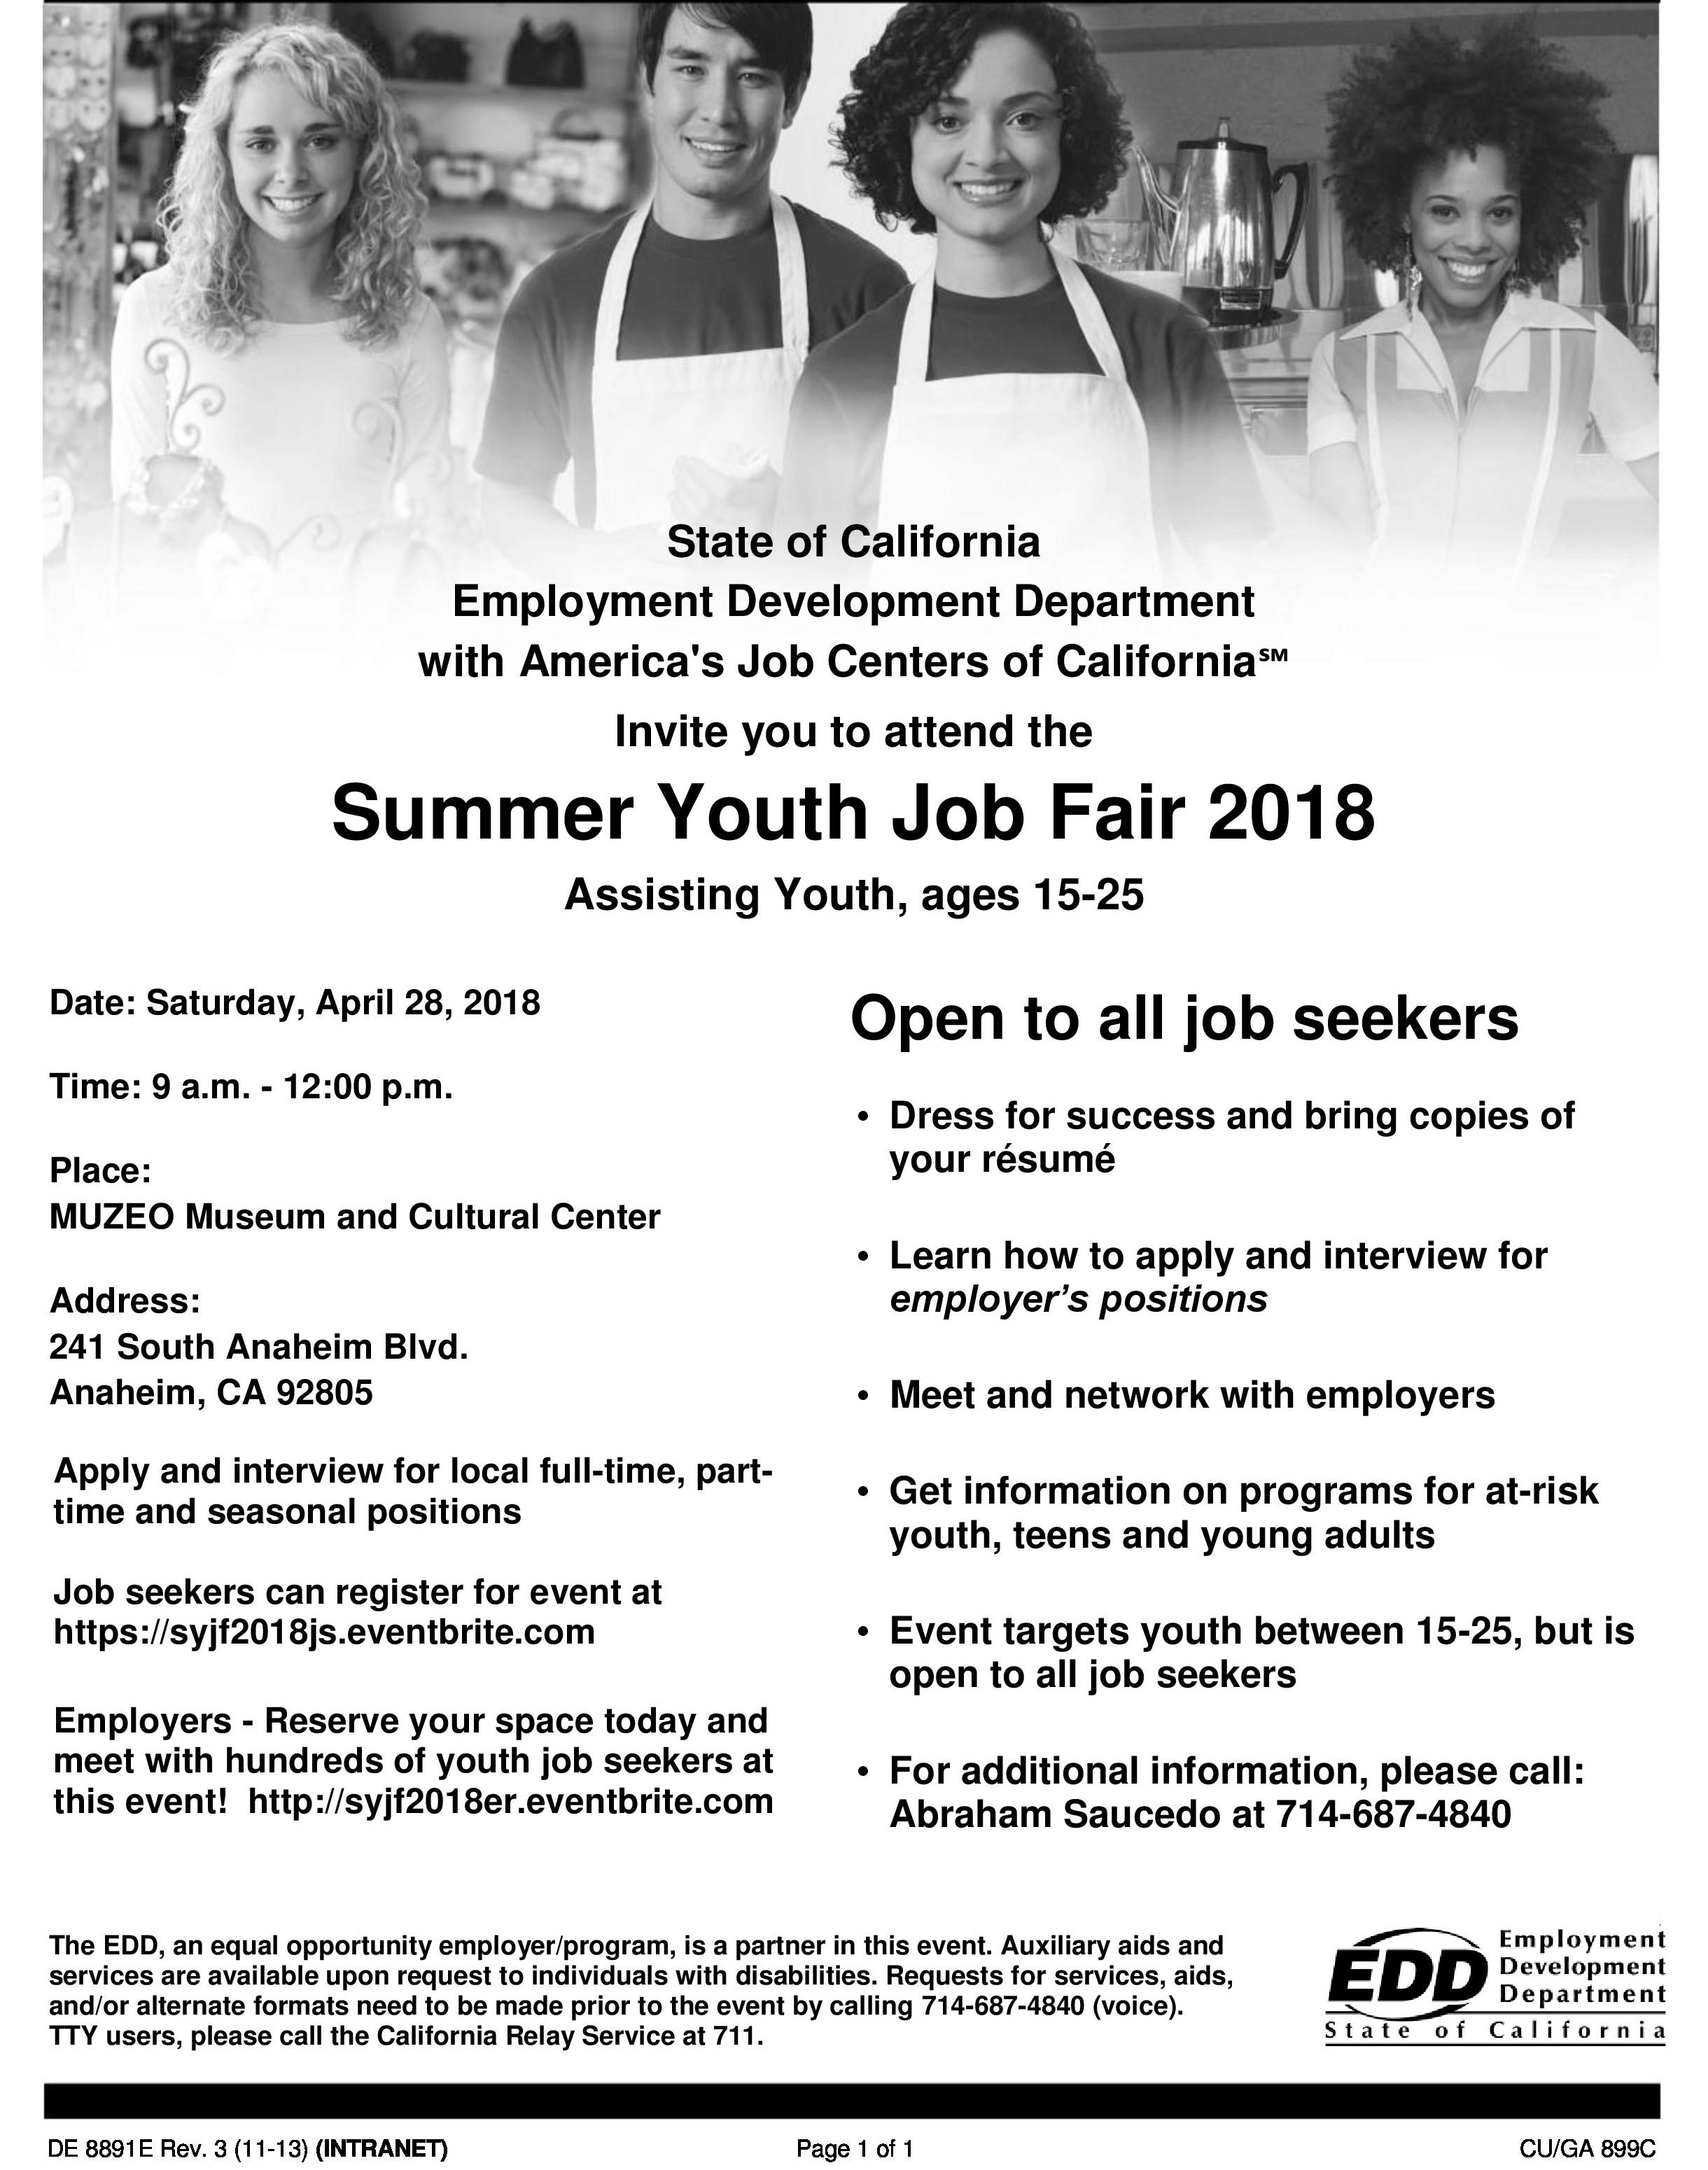 Summer Youth Job Fair 2018 Flyer